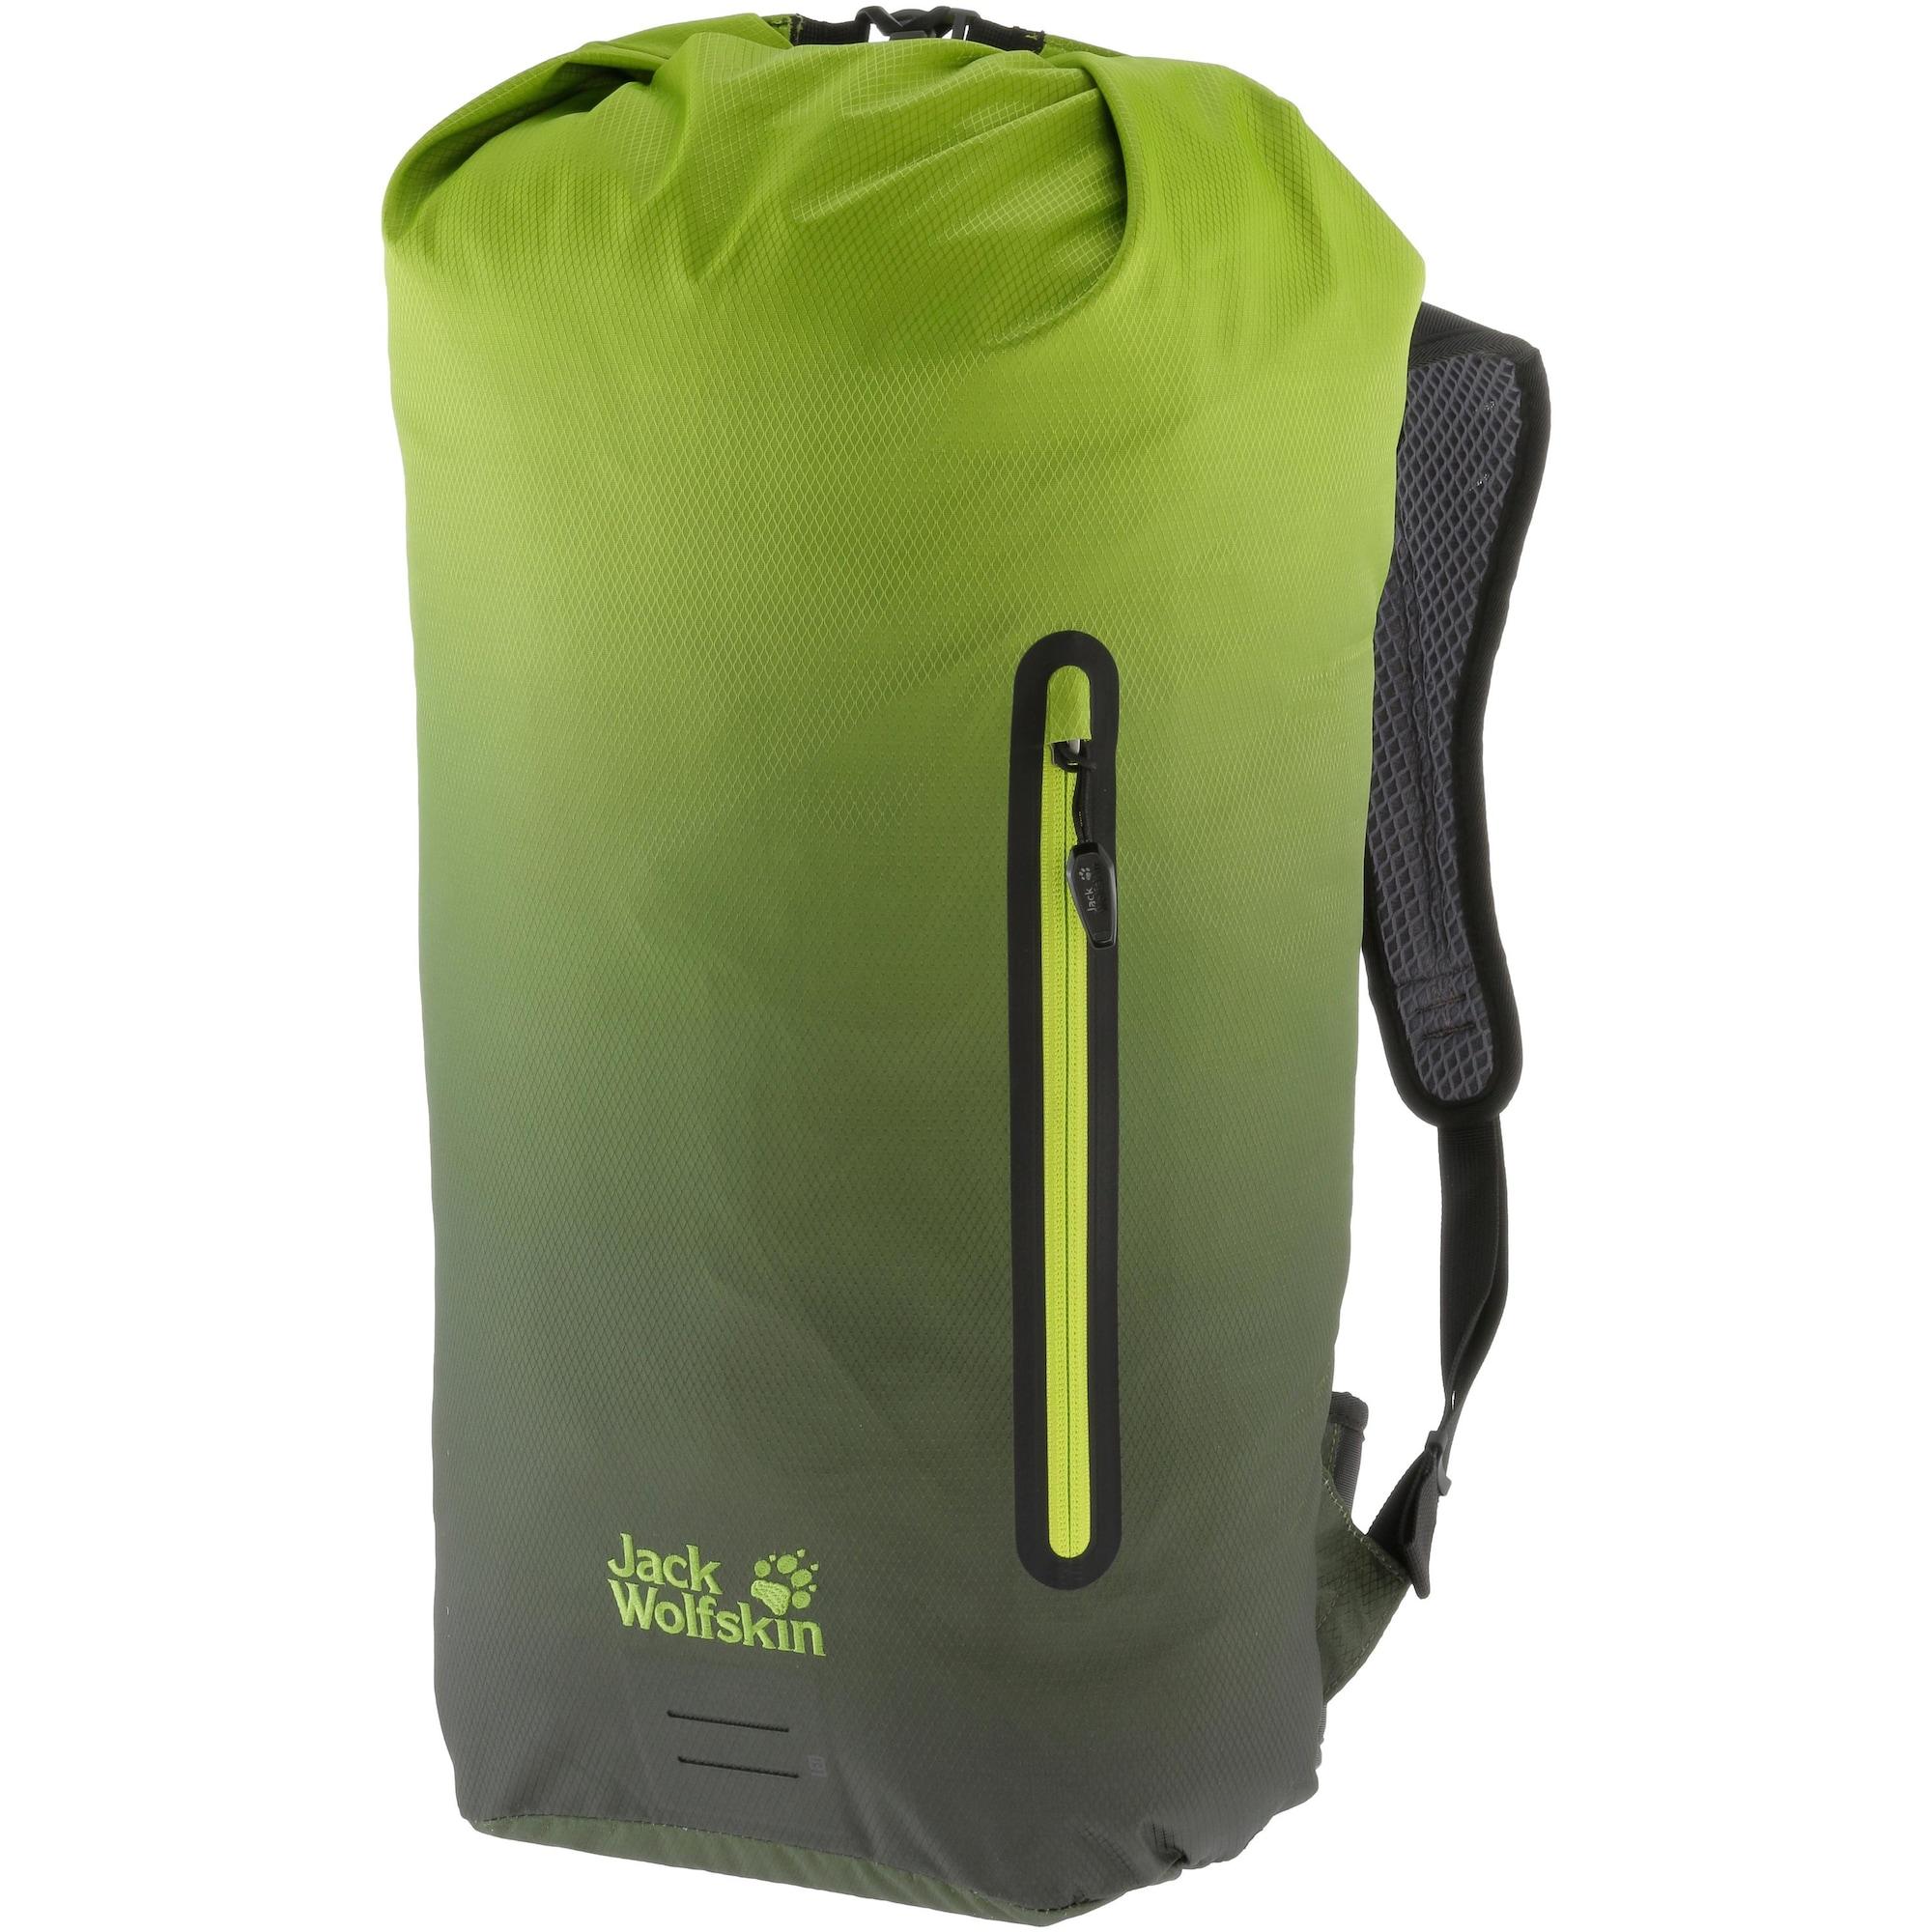 Daypack 'Halo' | Taschen > Rucksäcke > Fahrradrucksäcke | Jack Wolfskin